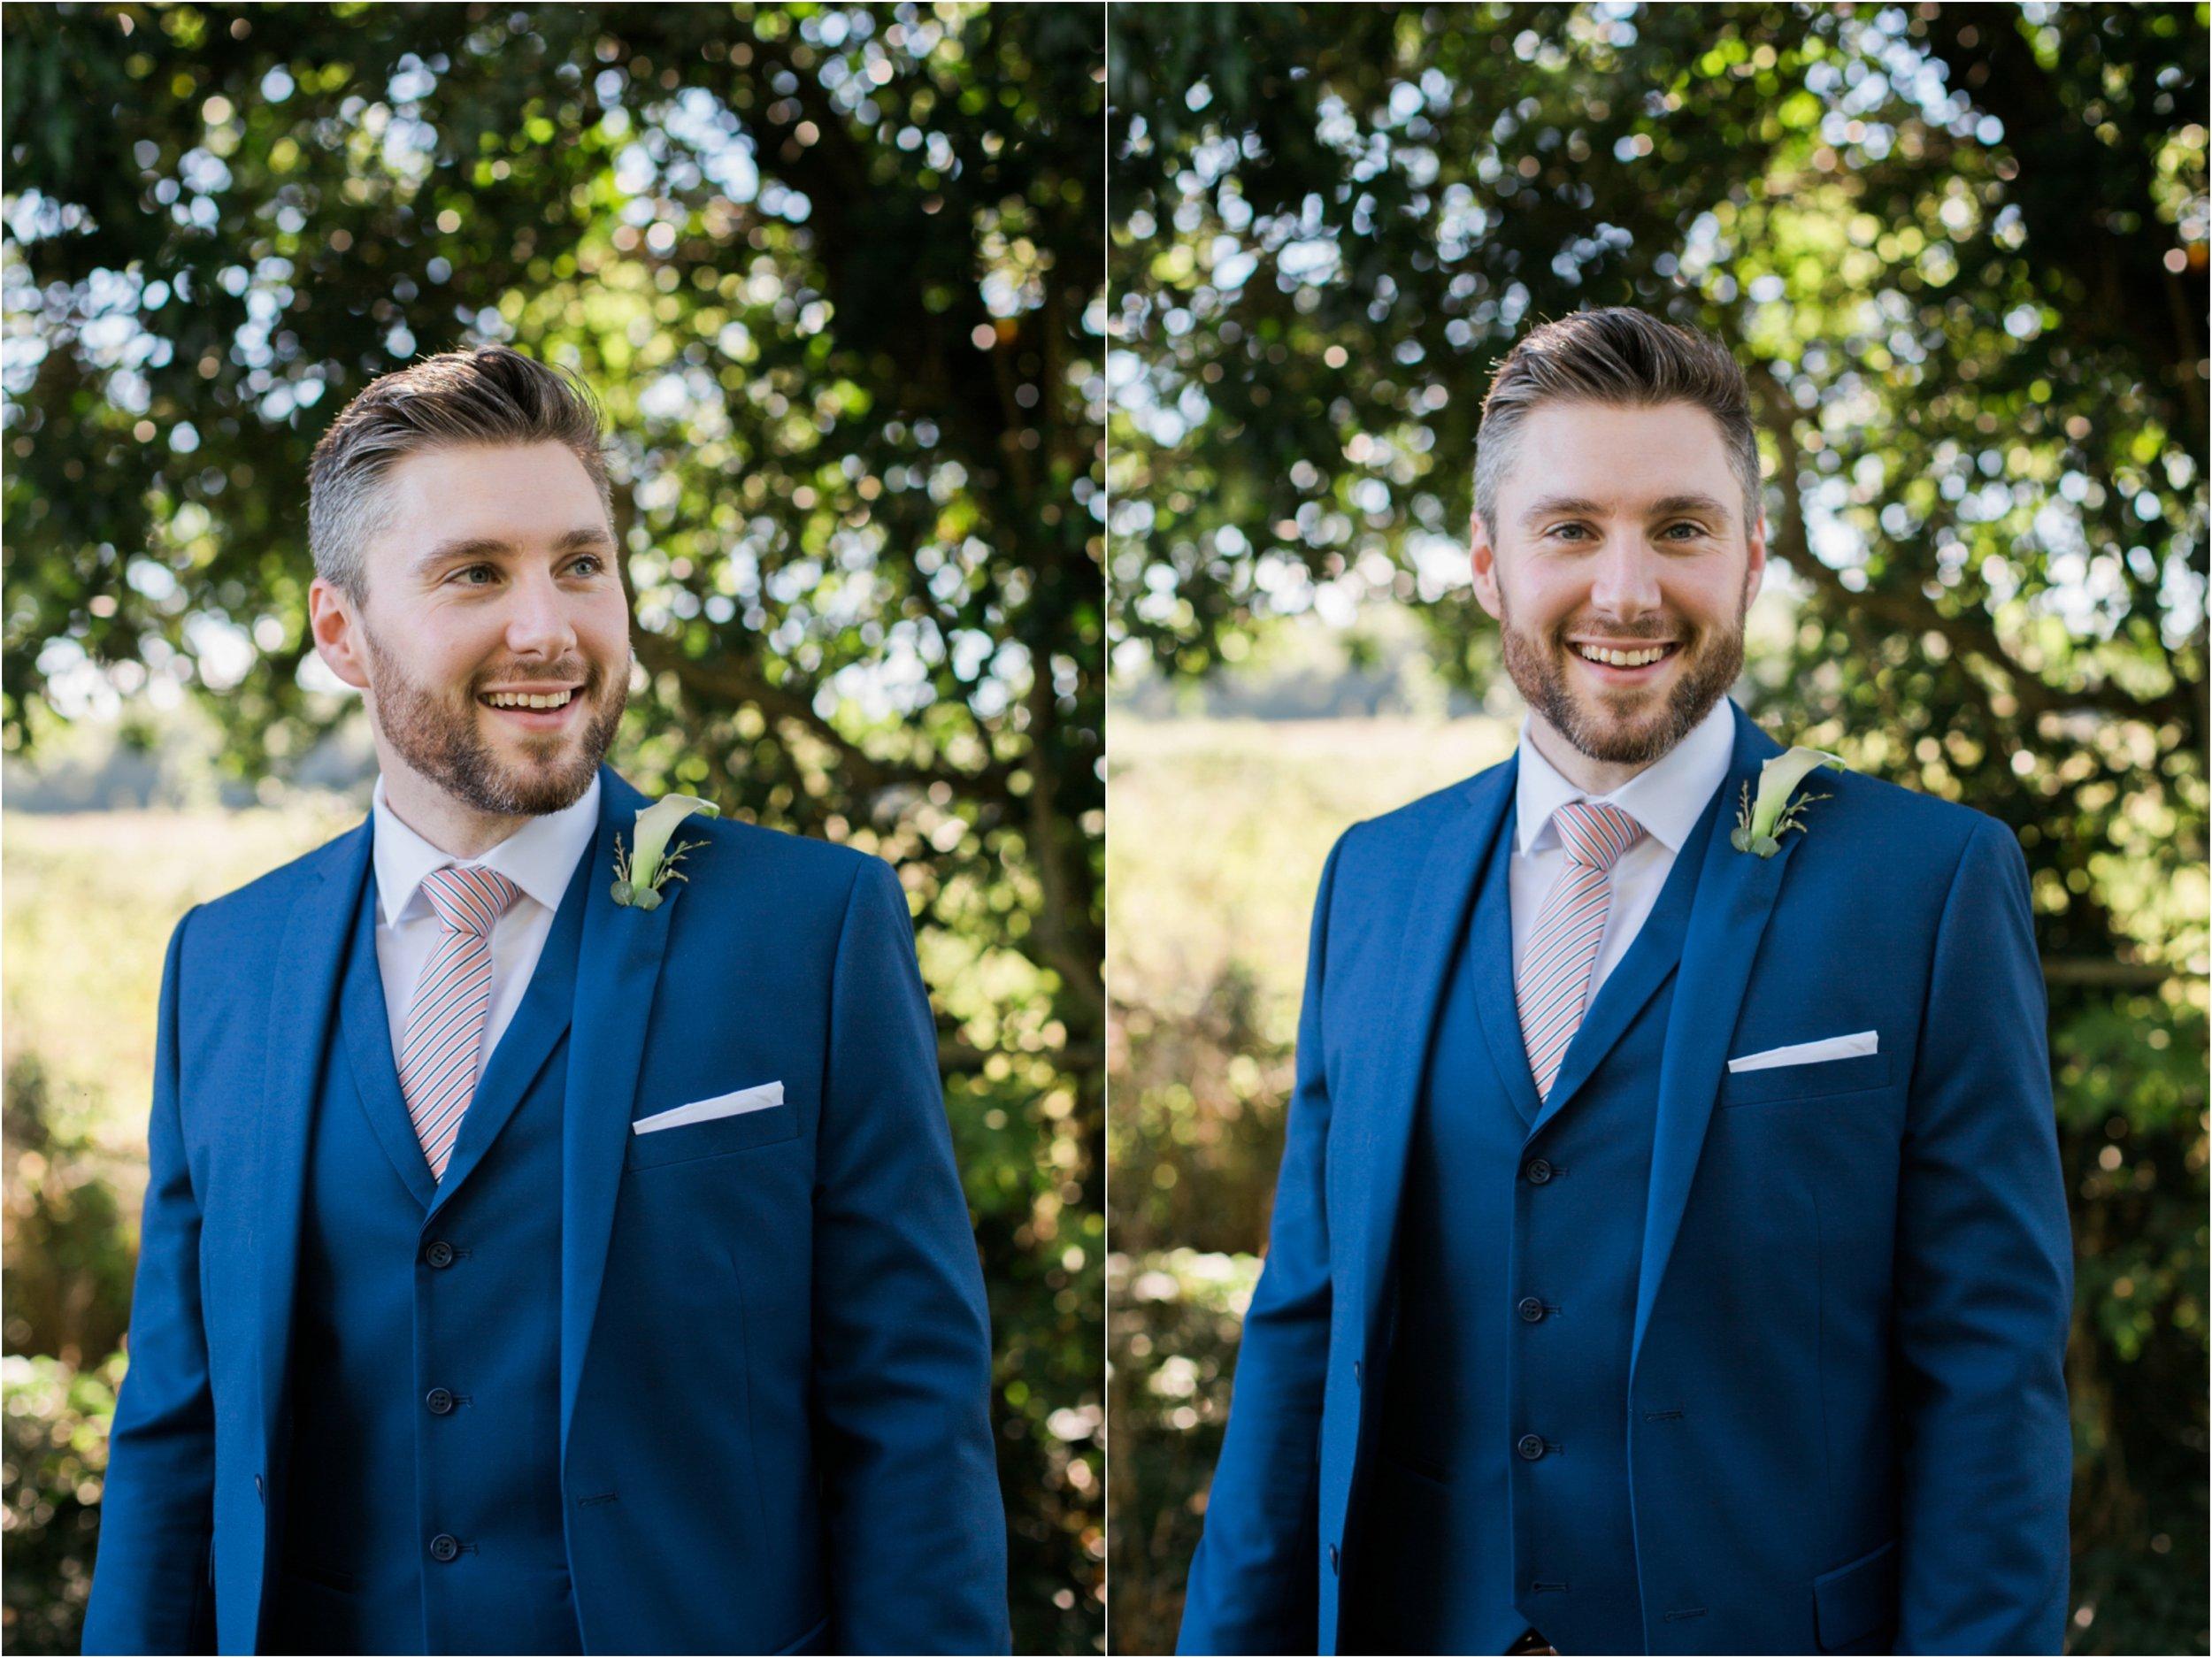 Sophie Evans Photography, Claire & John, Swallows Nest Barn Wedding, Warwickshire Wedding Photographer-91.jpg